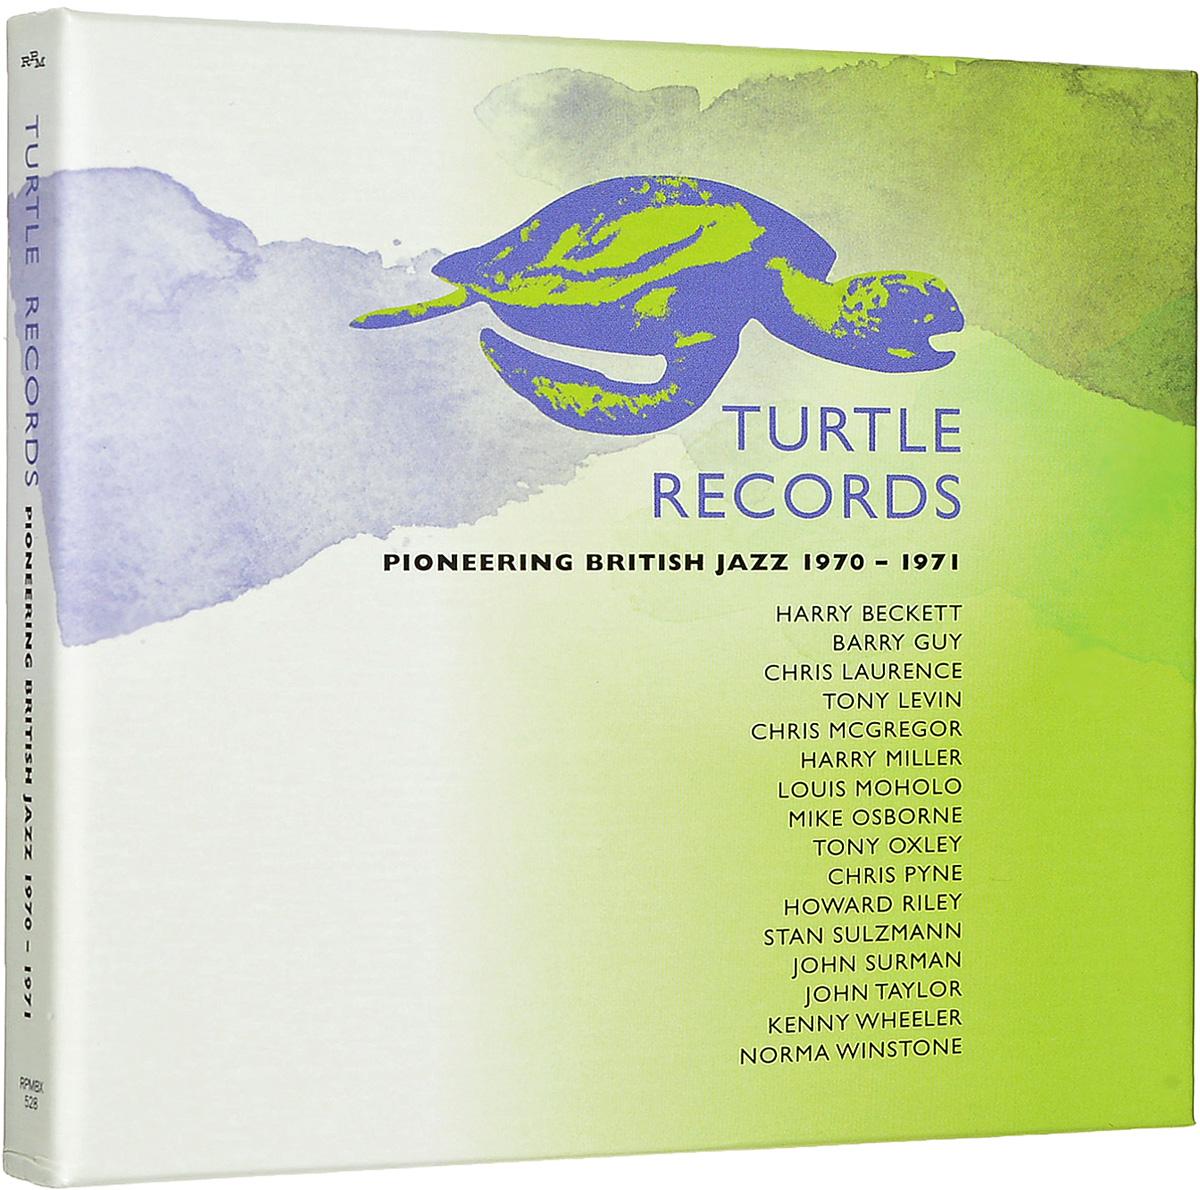 Turtle Records: Pioneering British Jazz 1970-1971 (3 CD)